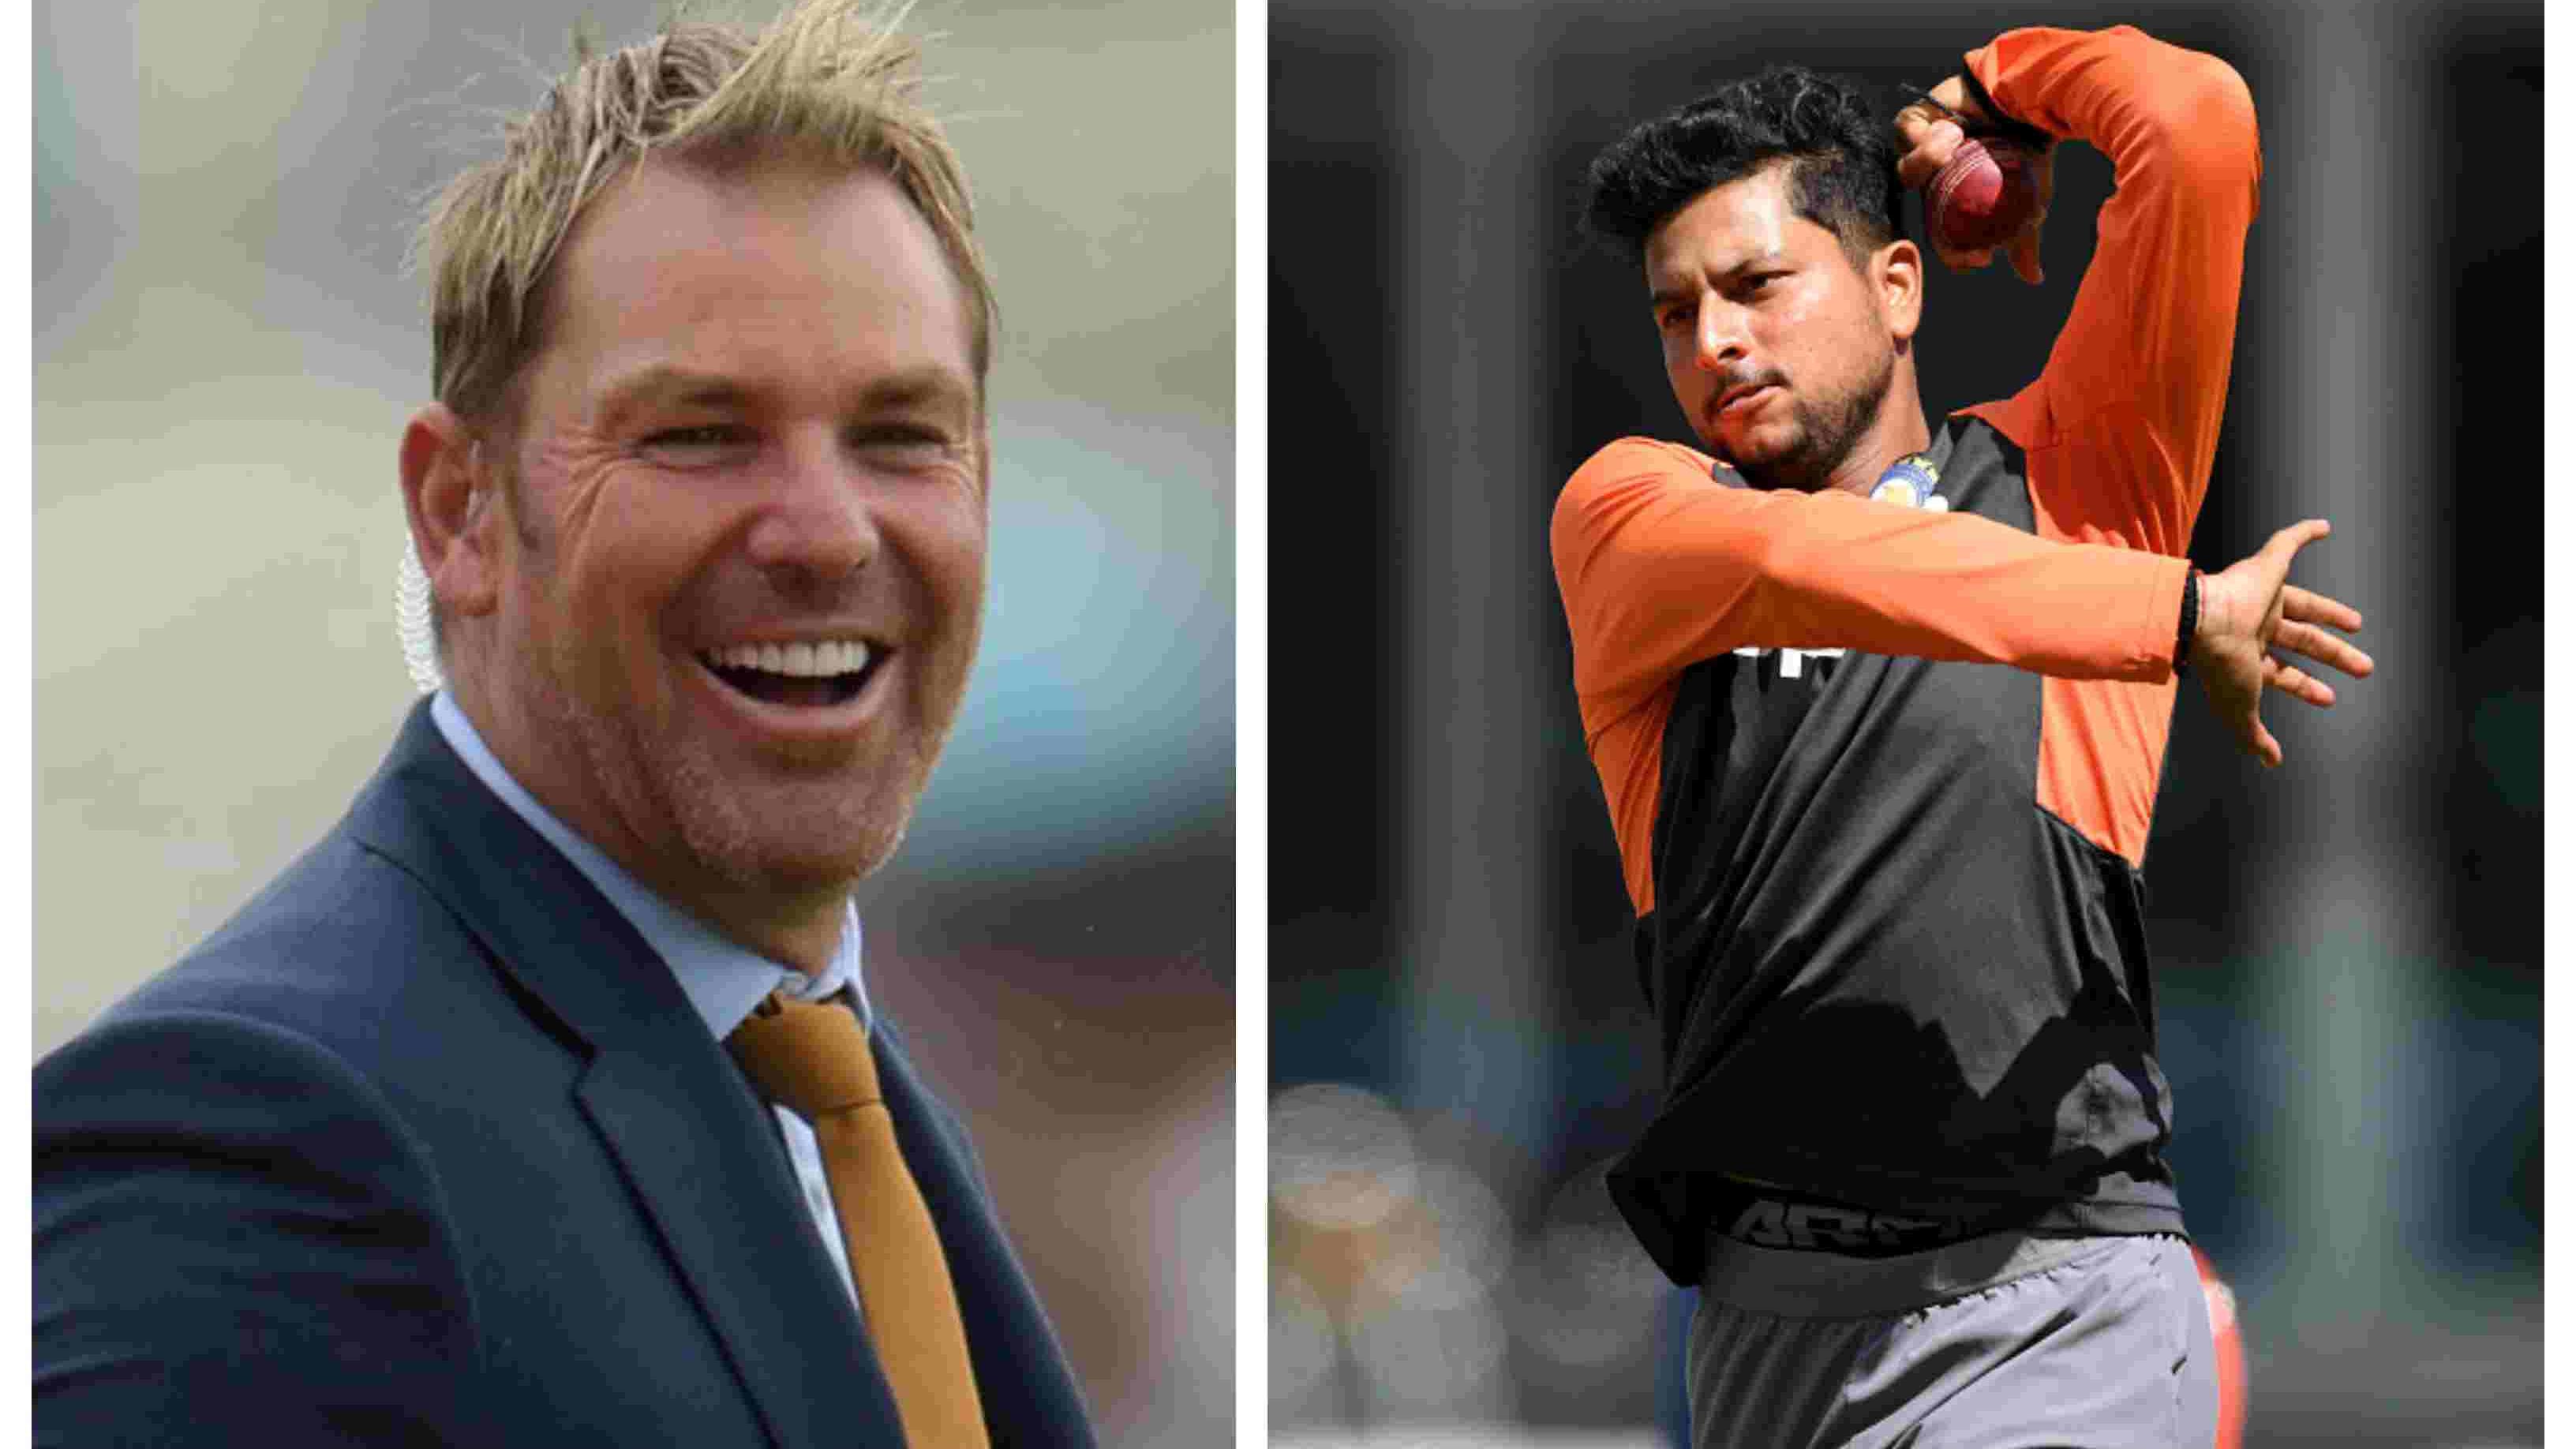 AUS v IND 2018-19: Kuldeep Yadav wants to follow Shane Warne's advice to take Australia down